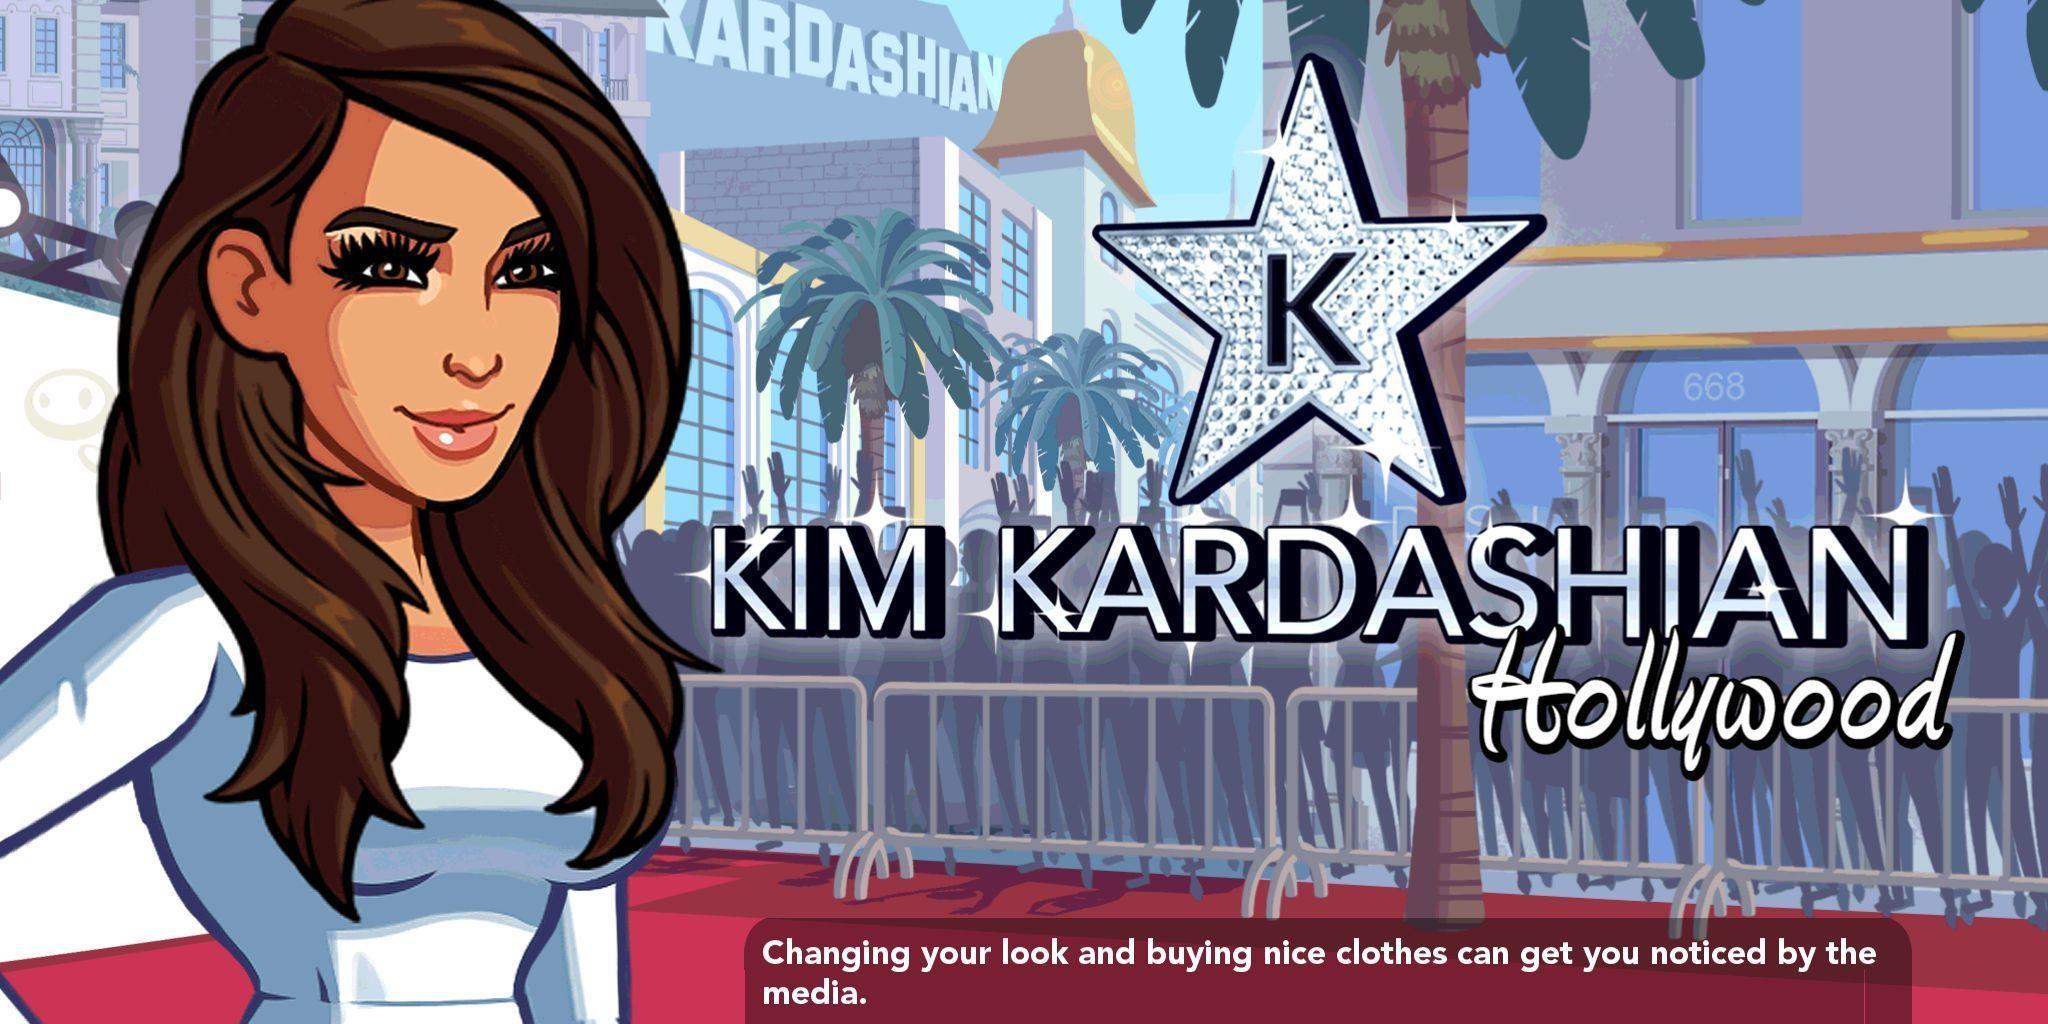 Som är Kim Kardashian dating nu 2014